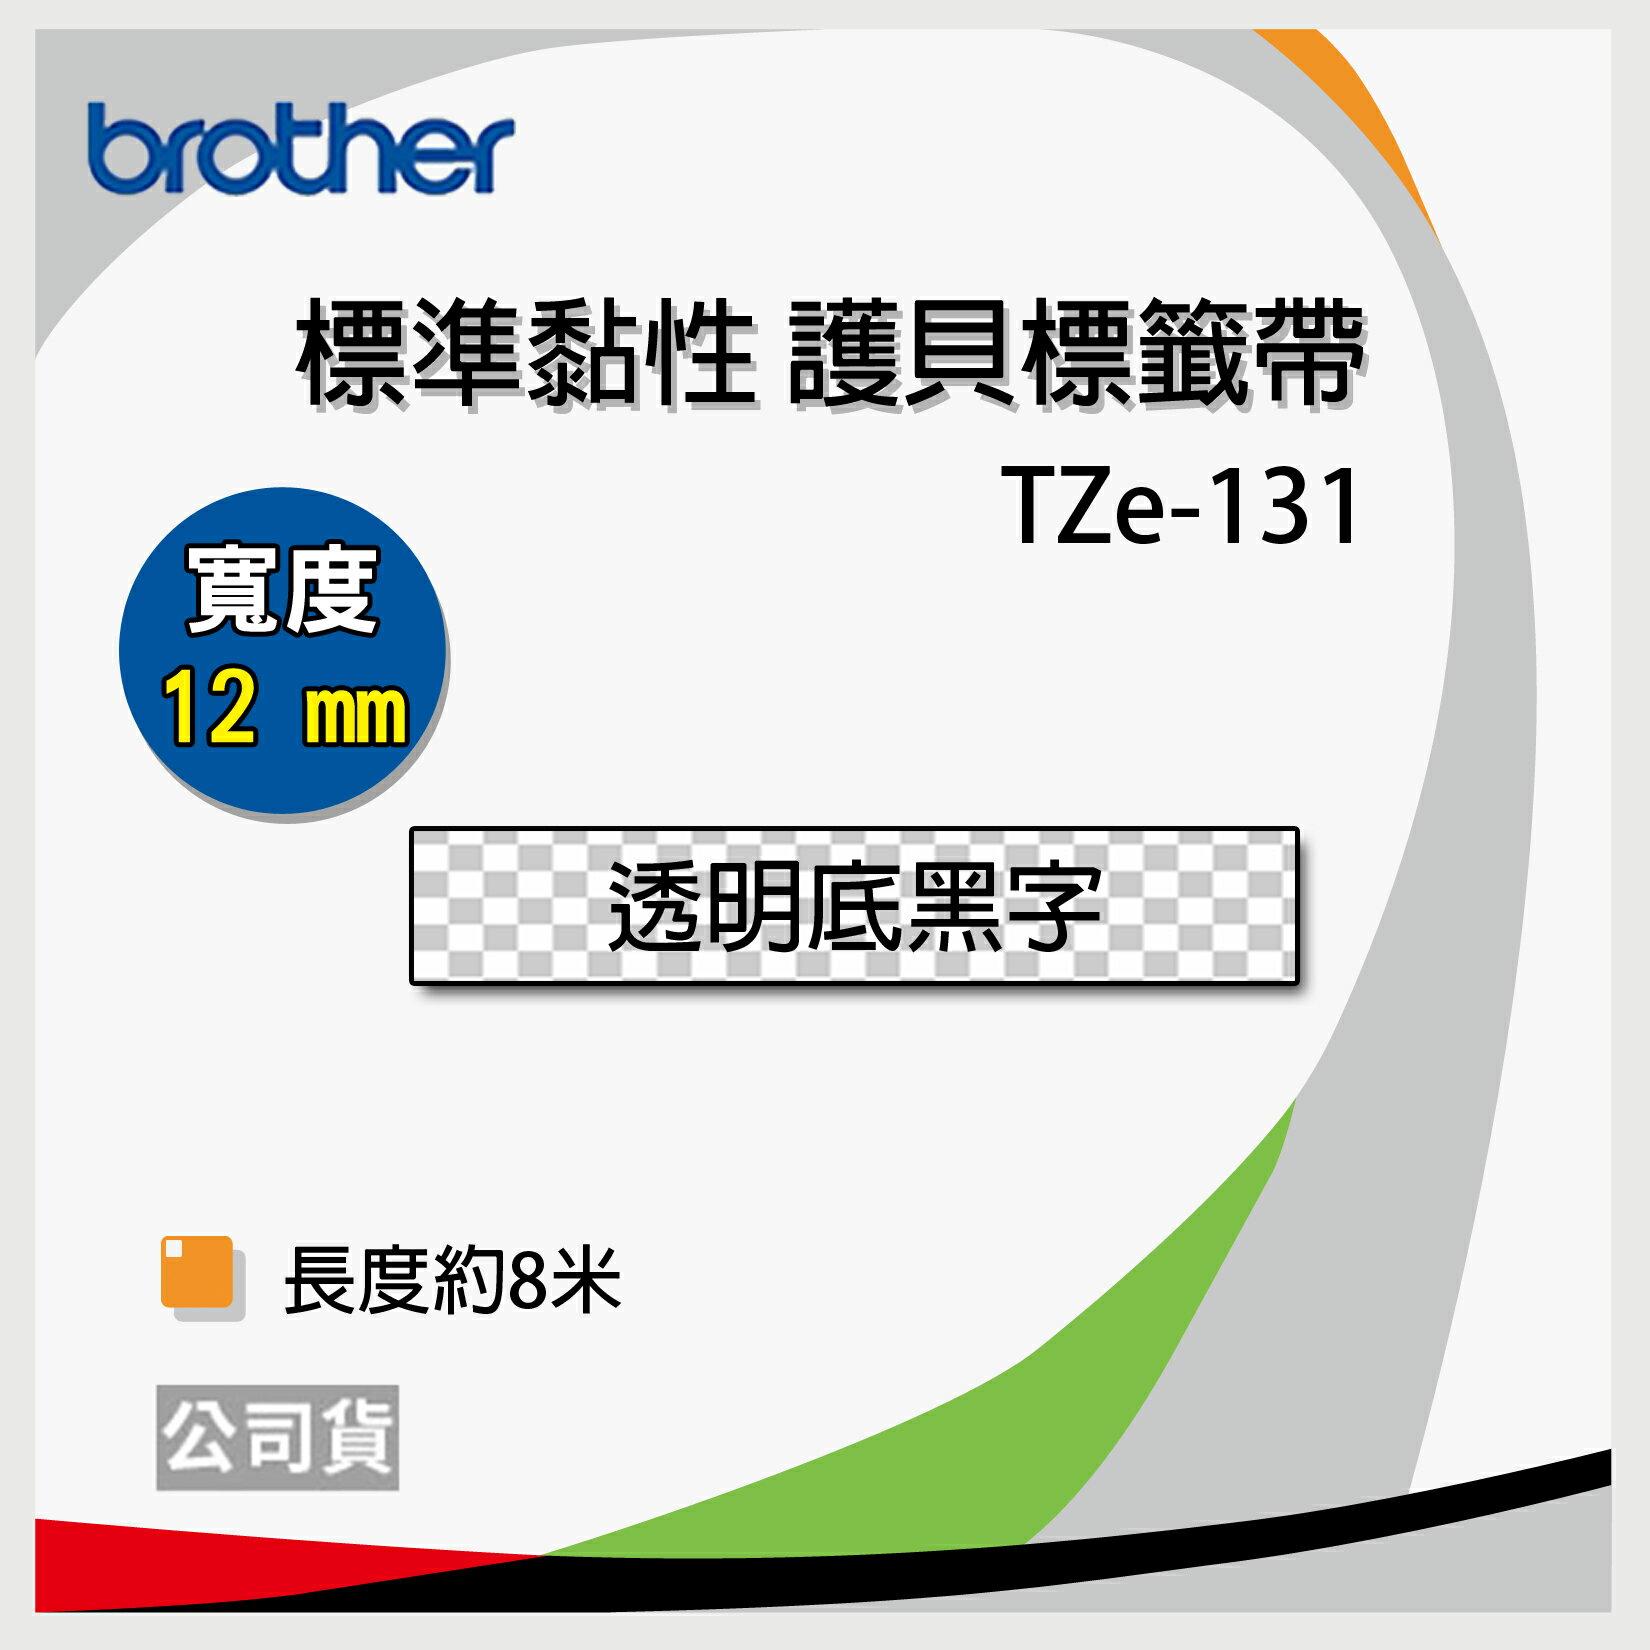 Brother 12mm 原廠護貝標籤帶系列 - TZ TZe-131 TZe-231 TZe-431 TZe-531 TZe-631 TZe-731 TZe-232 TZe-233